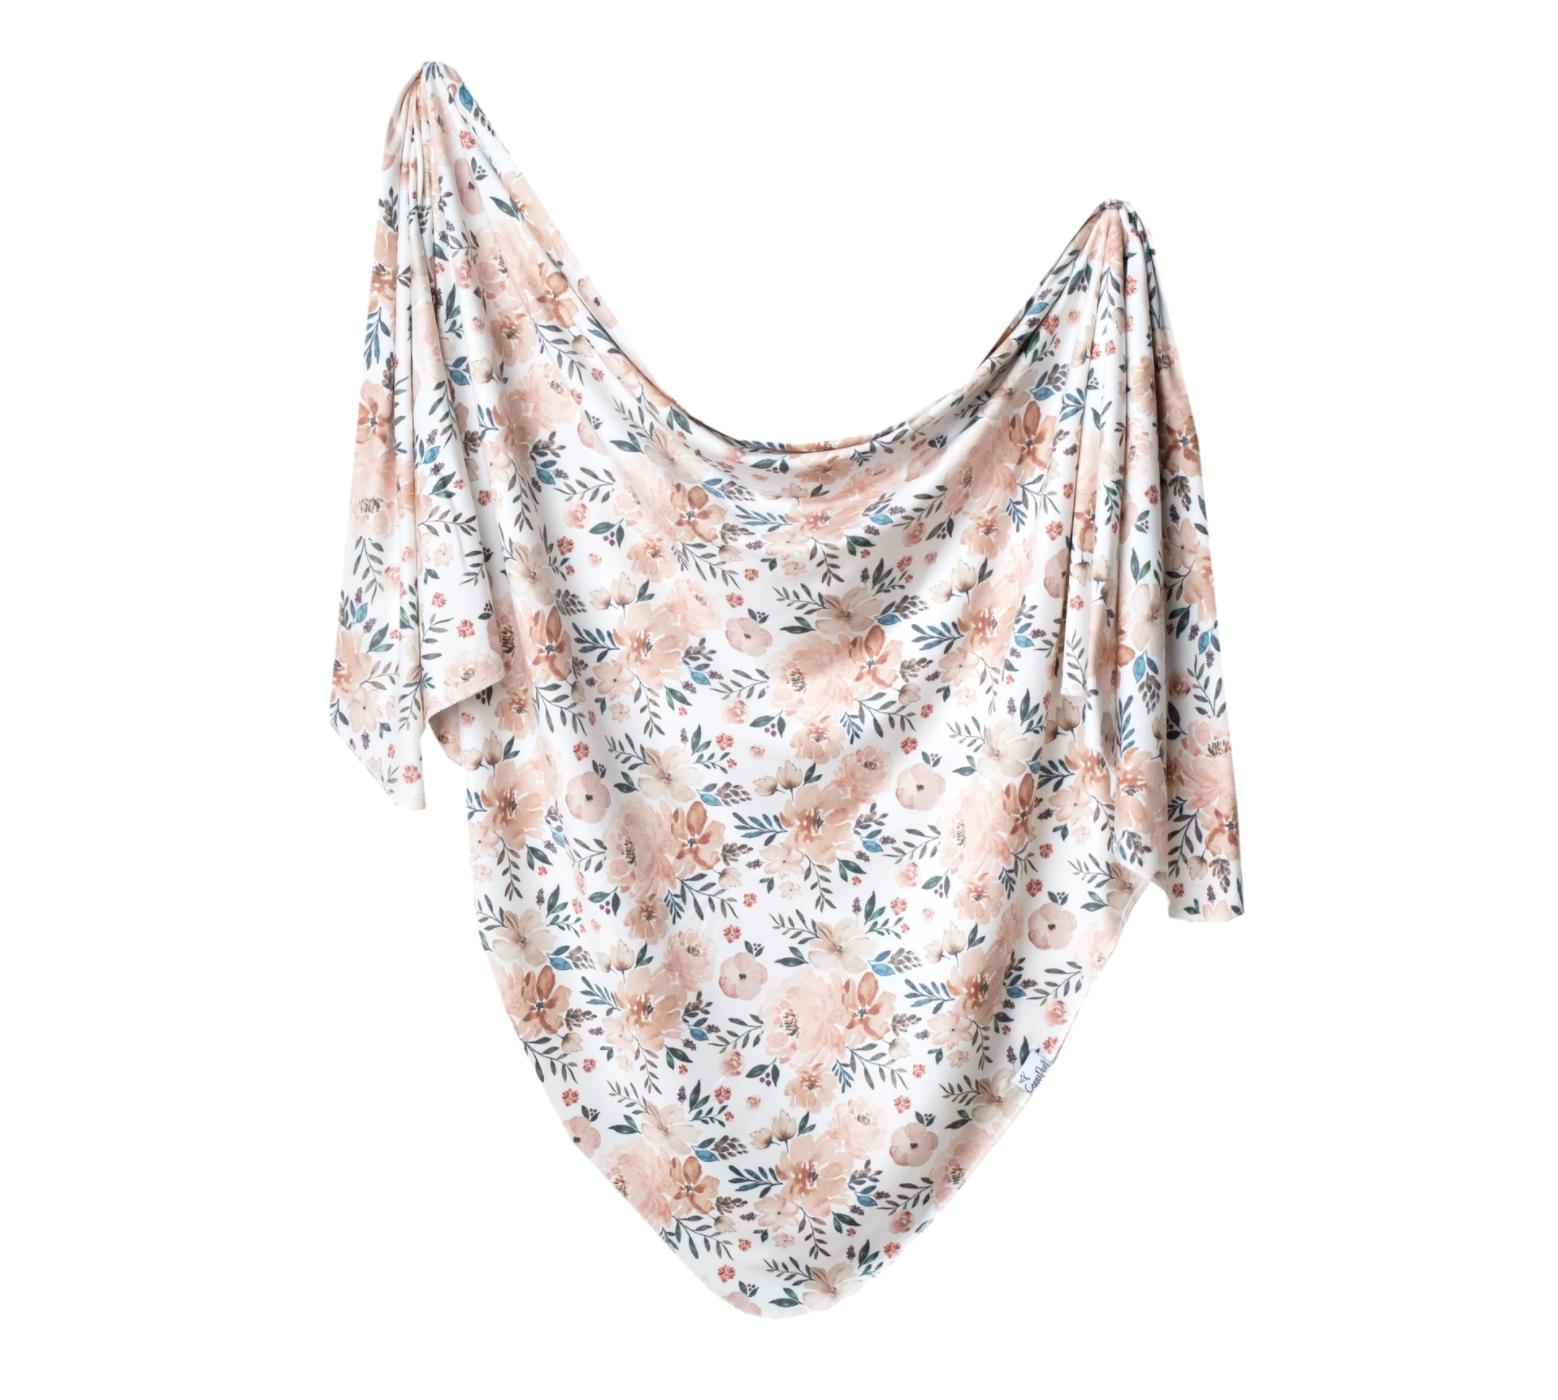 Copper Pearl Autumn Knit Blanket Single